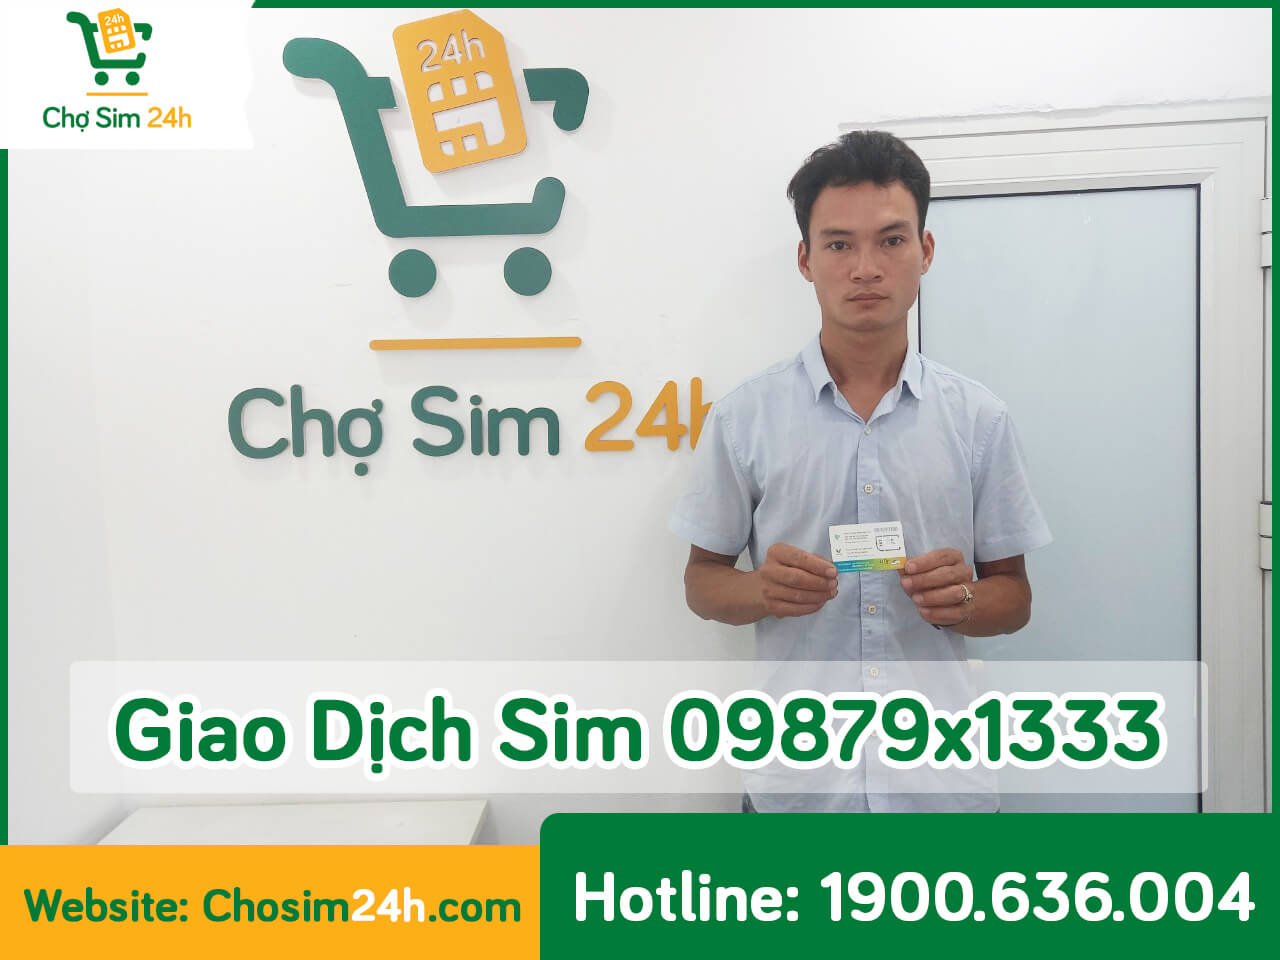 giao-dich-sim-09879x1333_1